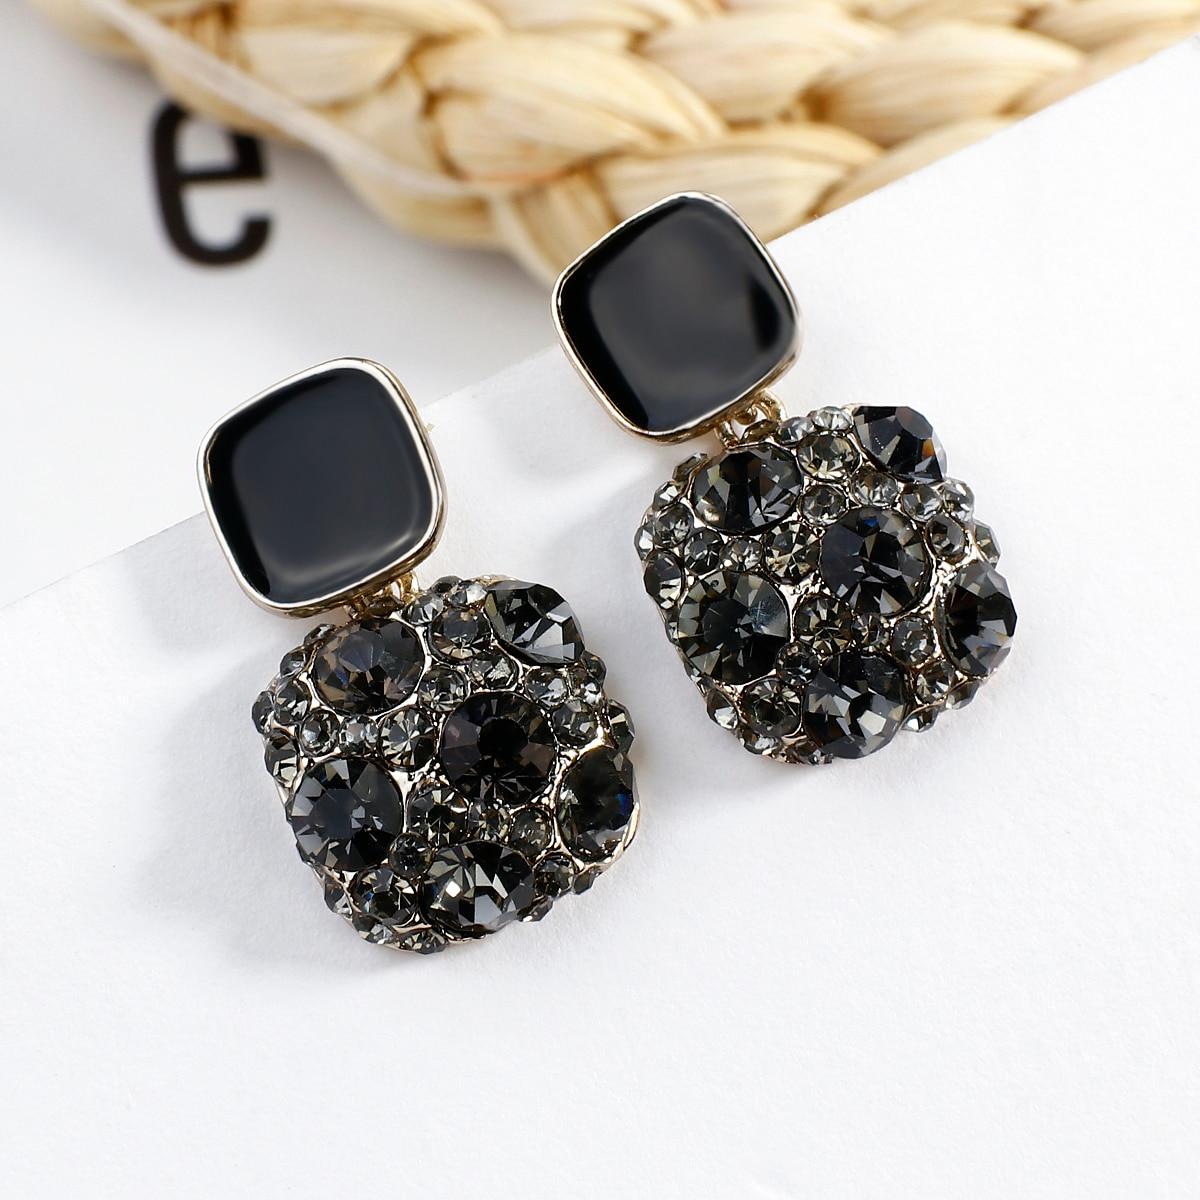 AENSOA New 2020 Fashion Women Crystal Earrings Small Rhinestone Vintage Korean Earrings Trendy Cute Lovely Shiny Party Jewelry